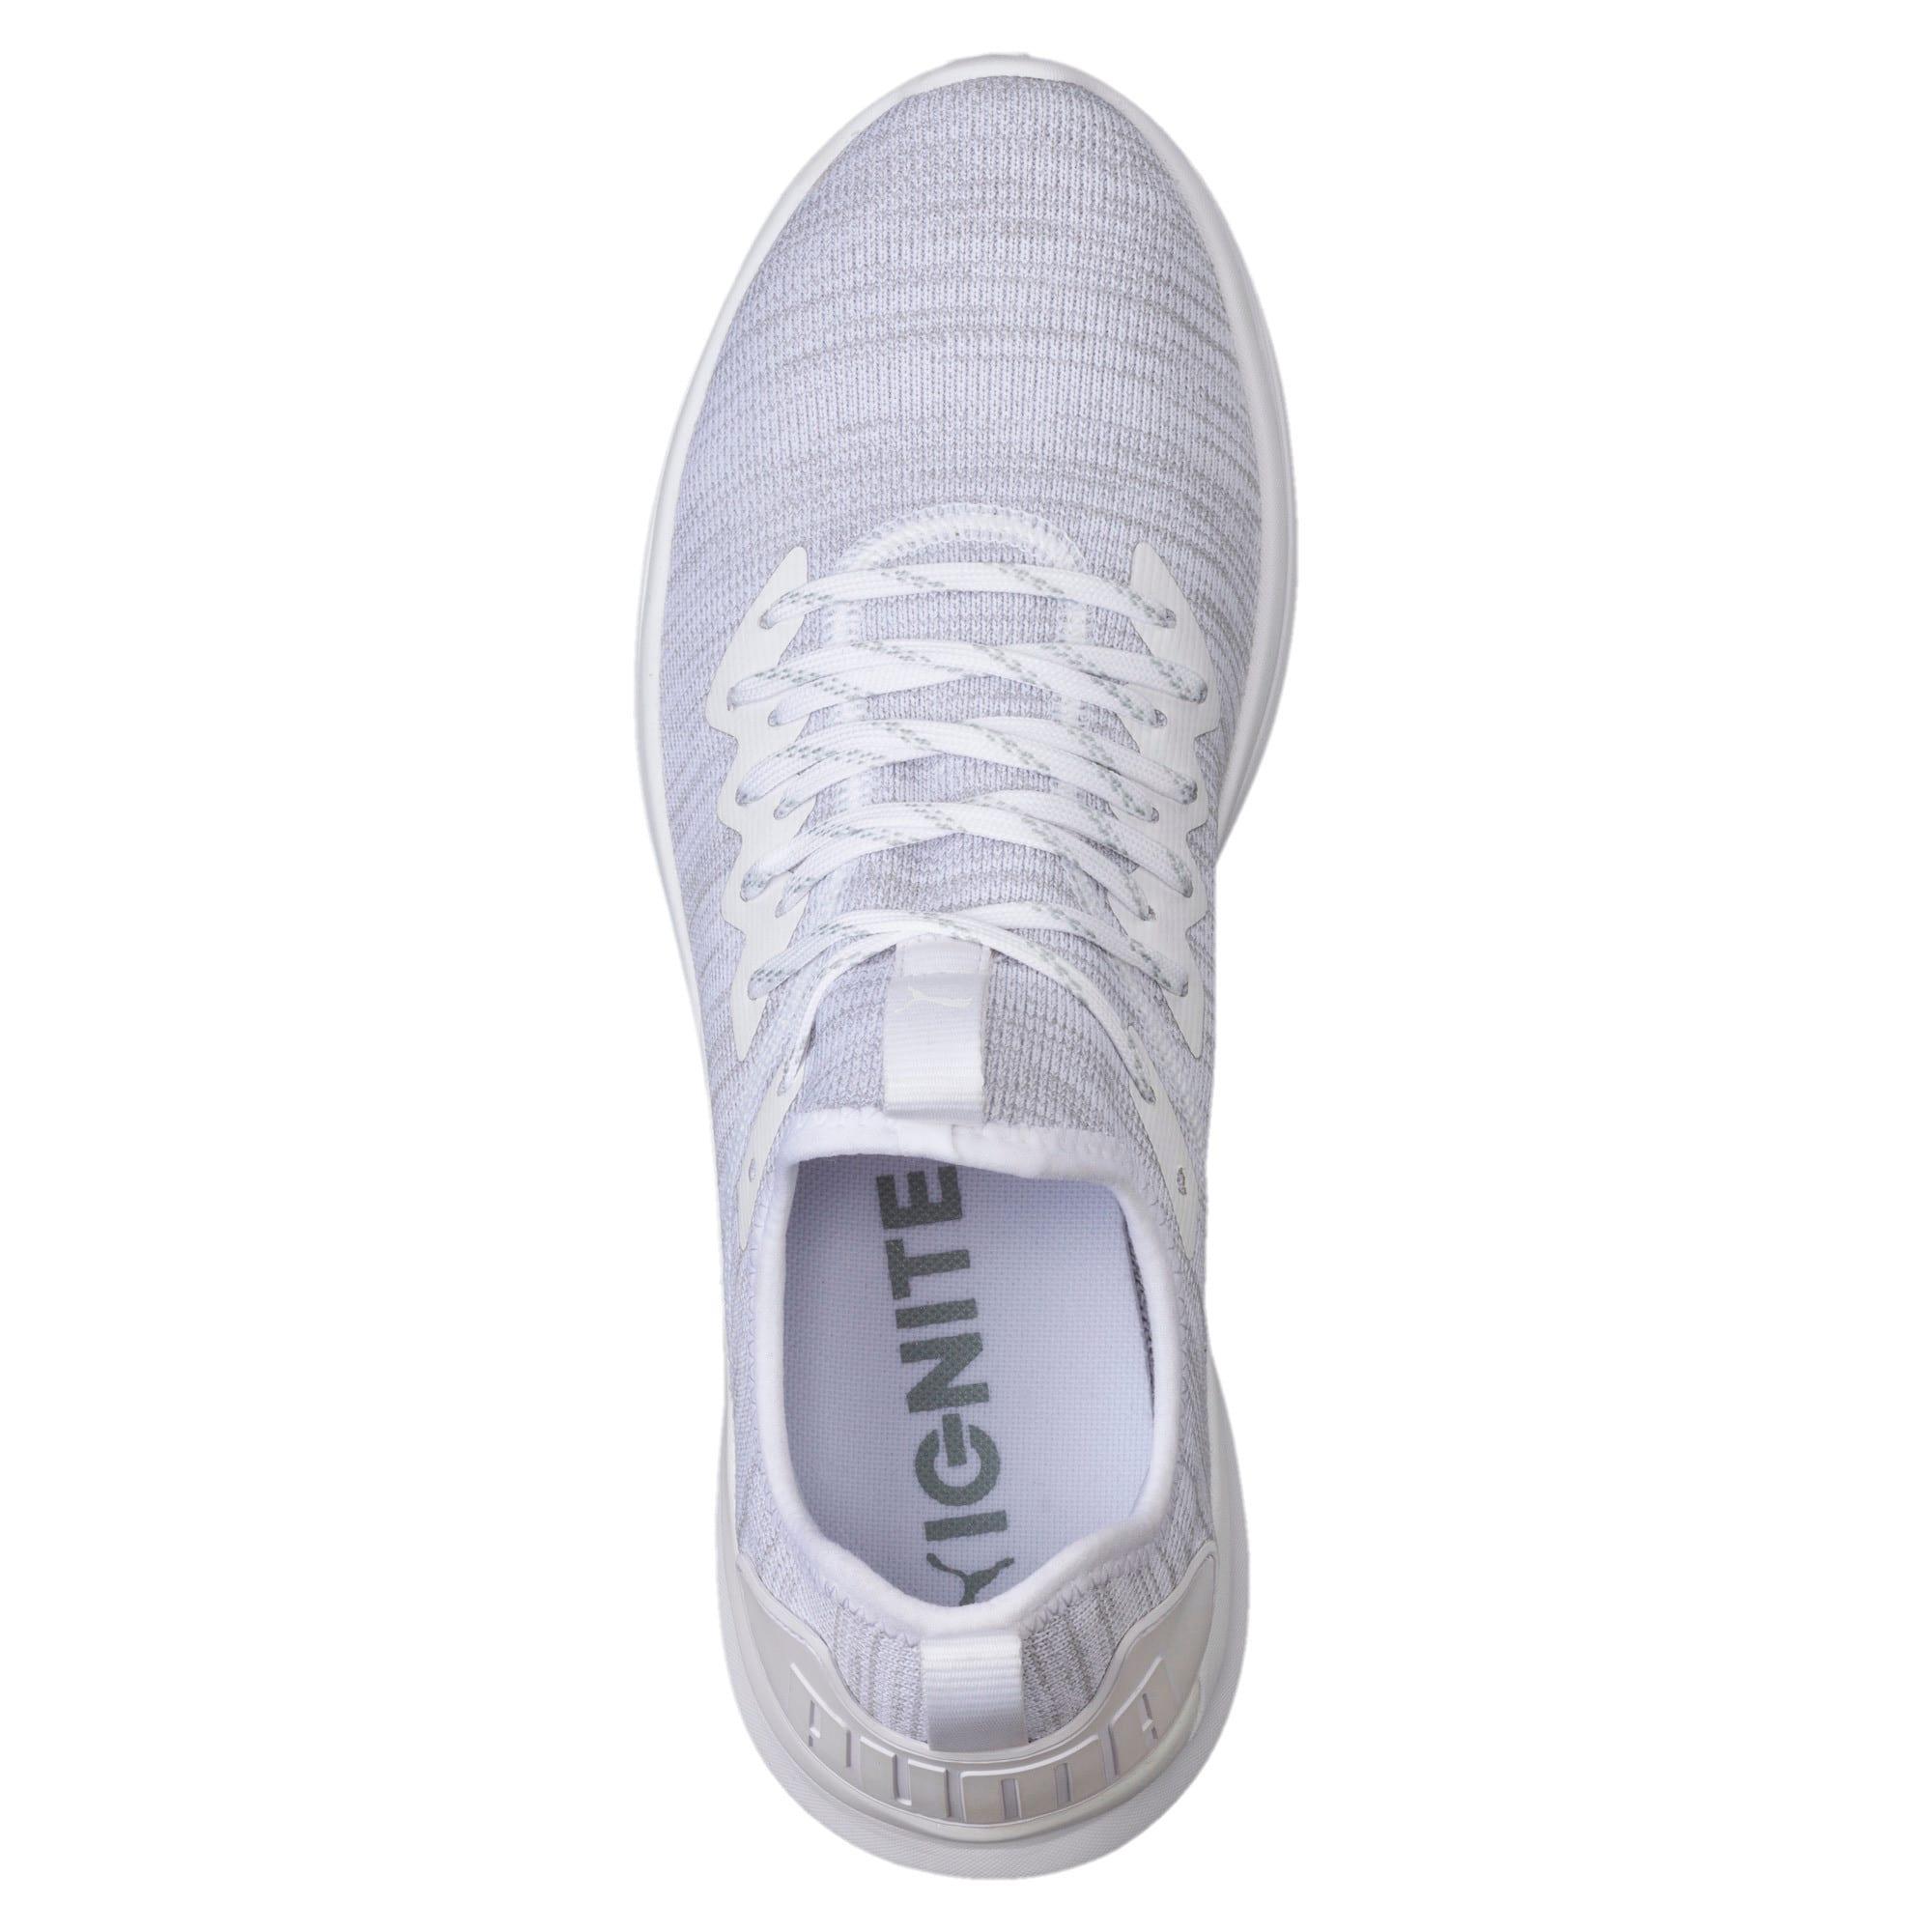 Thumbnail 5 of IGNITE Flash evoKNIT Men's Training Shoes, Puma White, medium-IND